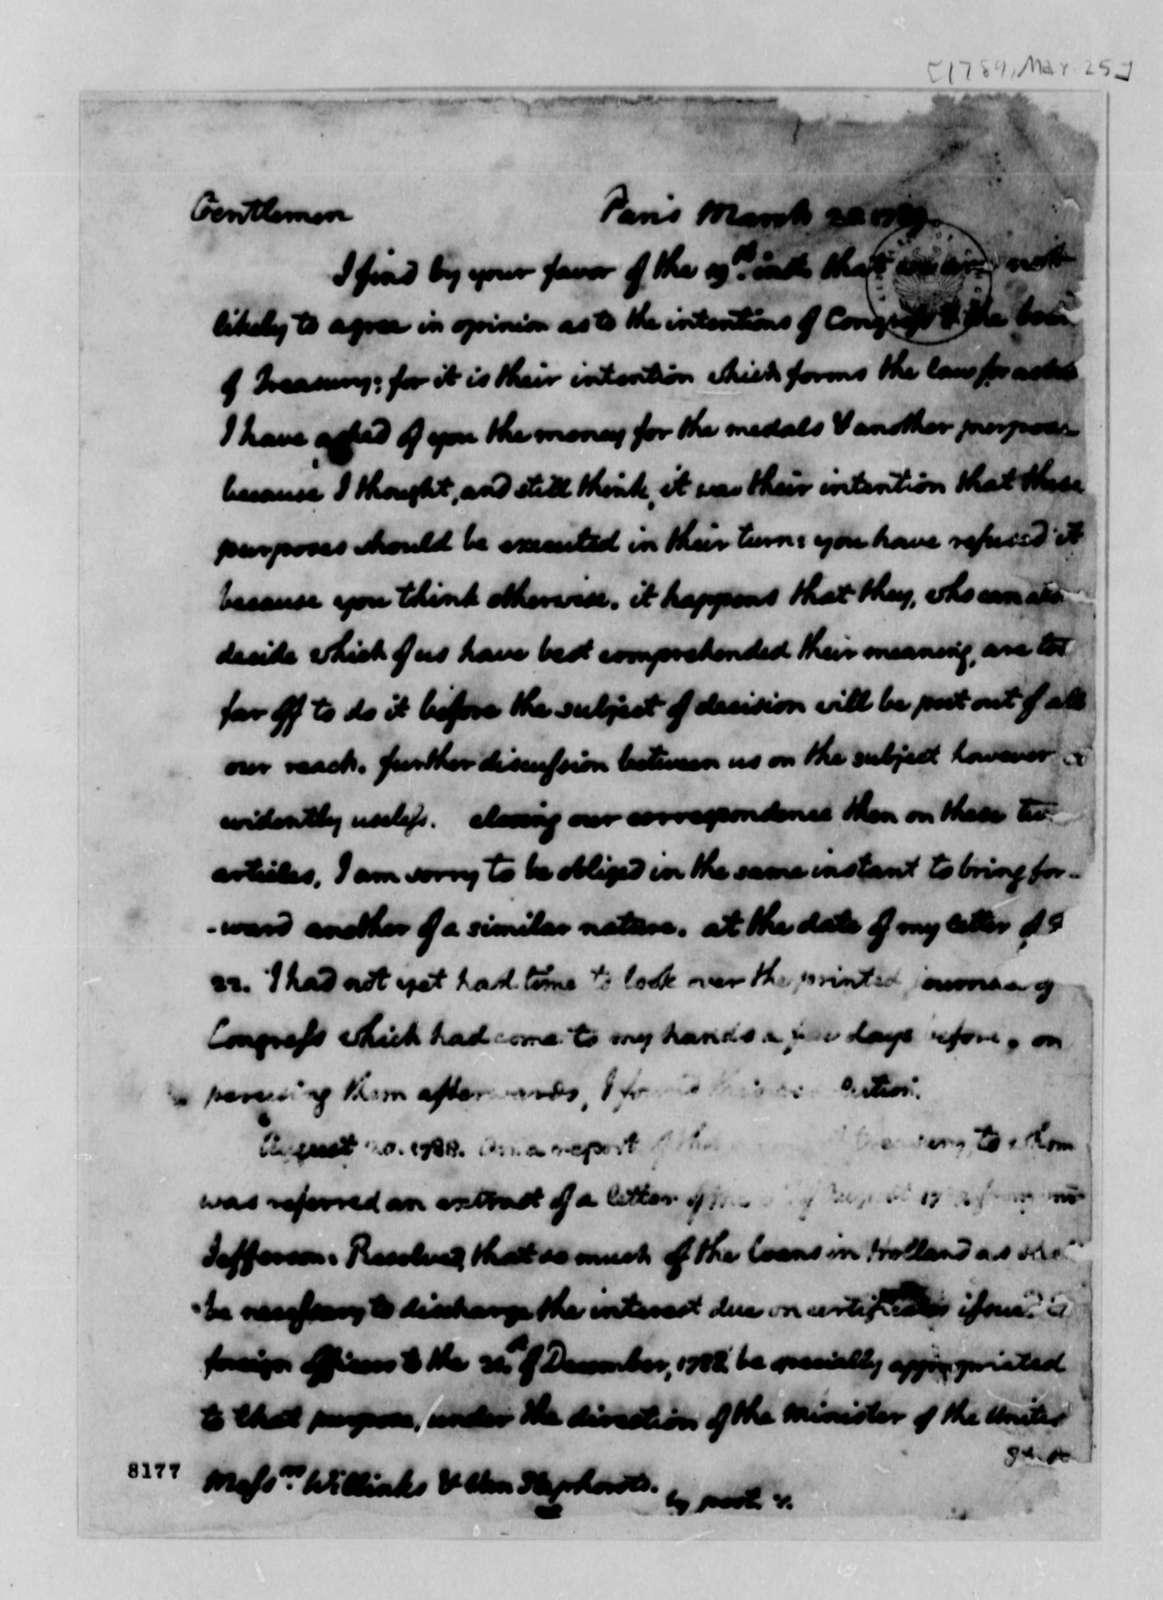 Thomas Jefferson to Wilhelm Willink, et al, March 25, 1789